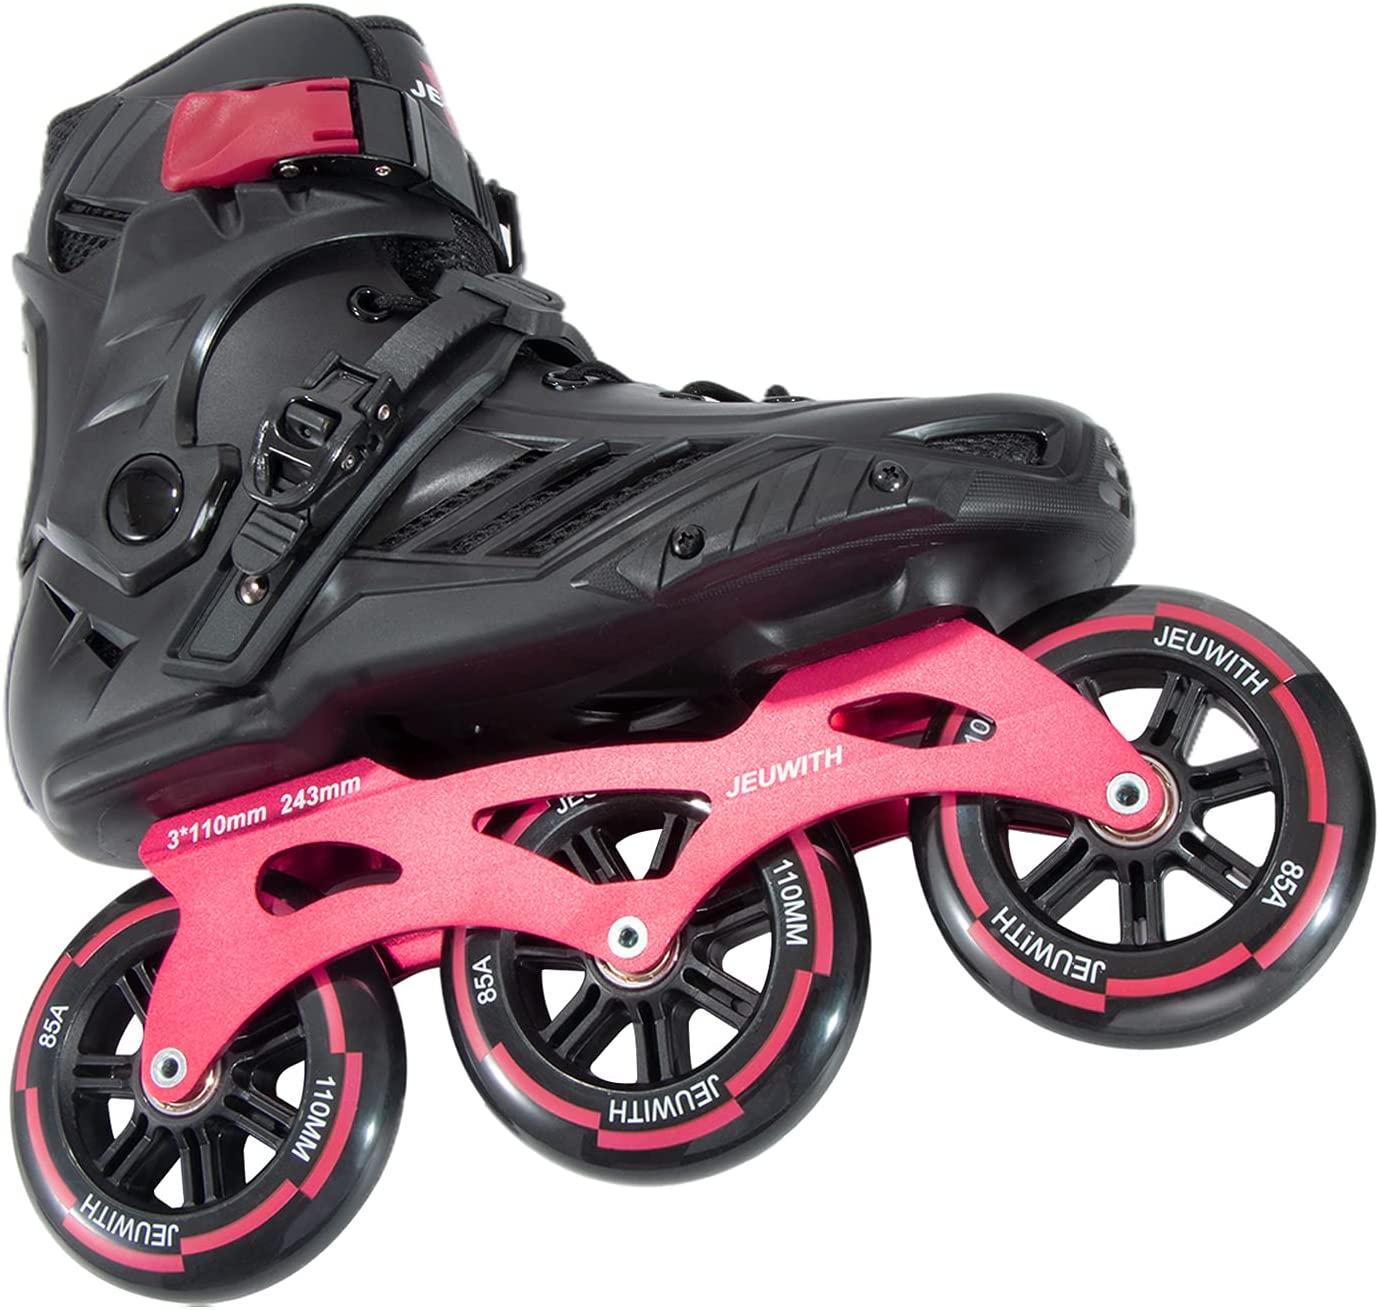 JEUWITH 3-Wheel Fitness Inline Skates, best rollerblades for men